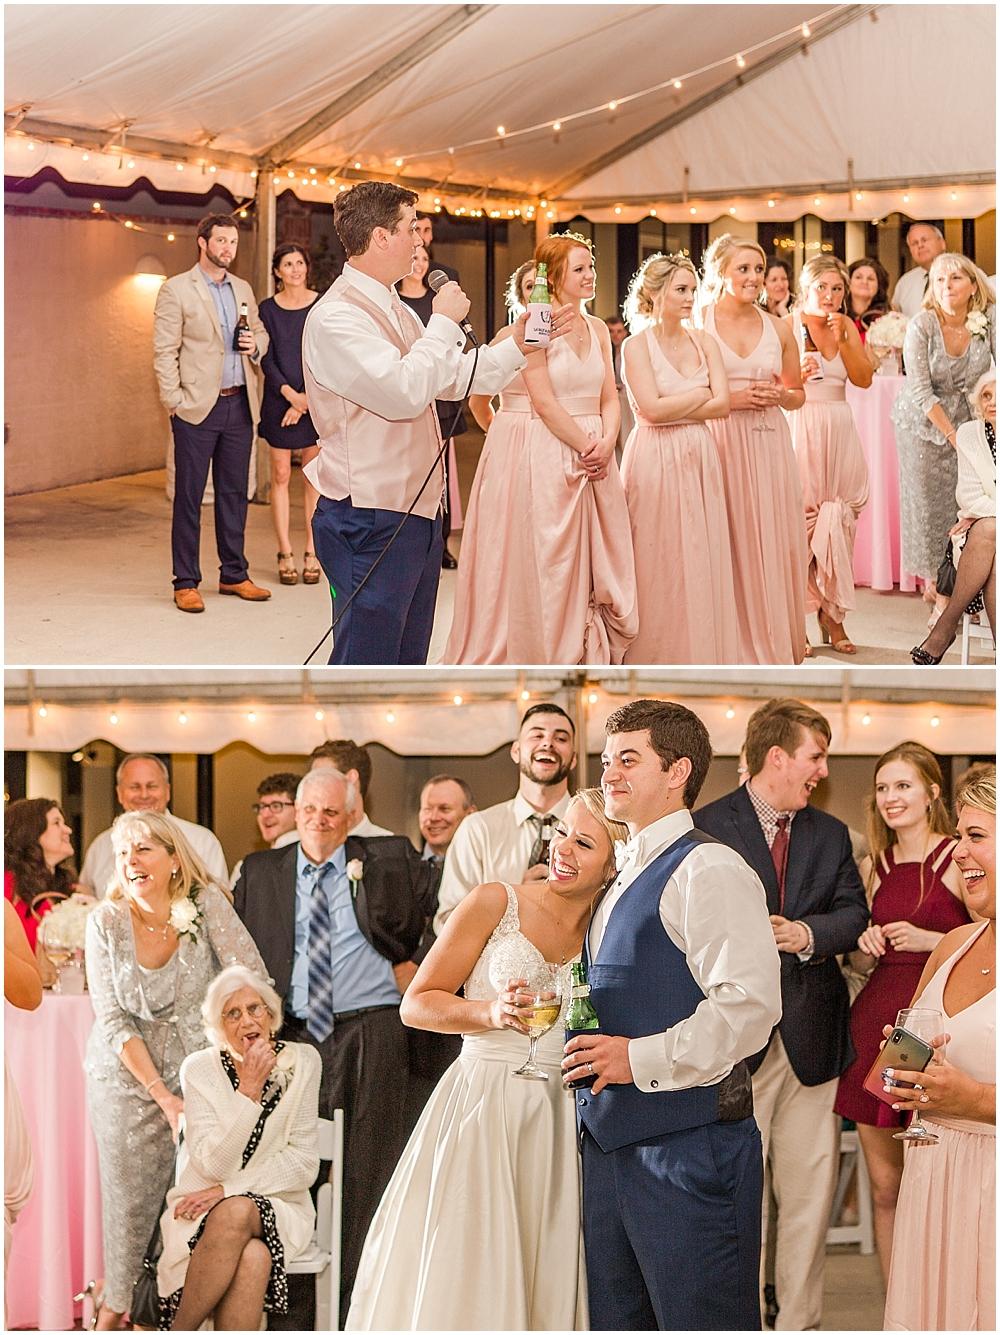 Ashton-Clark-Photography-Wedding-Portrait-Family-Photographer-Mobile-Alabama_0377.jpg